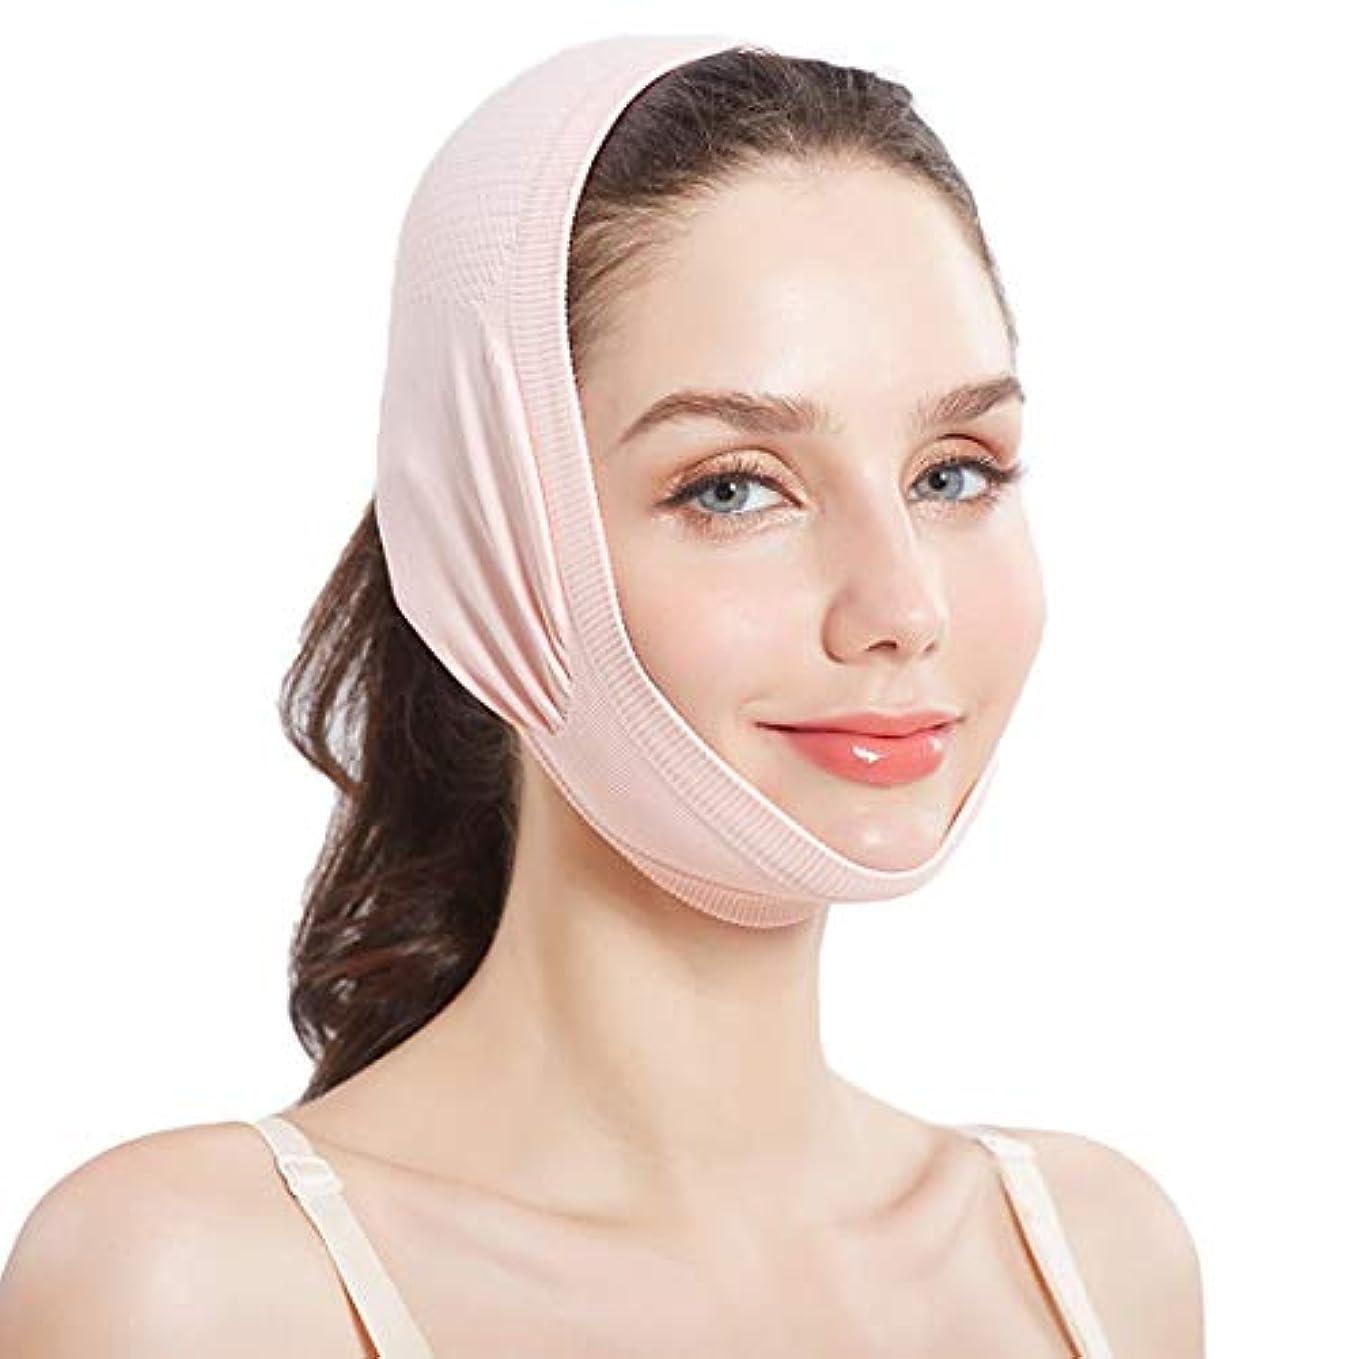 ZWBD フェイスマスク, フェイスリフティング包帯マスクあごV整形マスク美容包帯マスクリフティング引き締めピンクベージュ (Color : Pink)